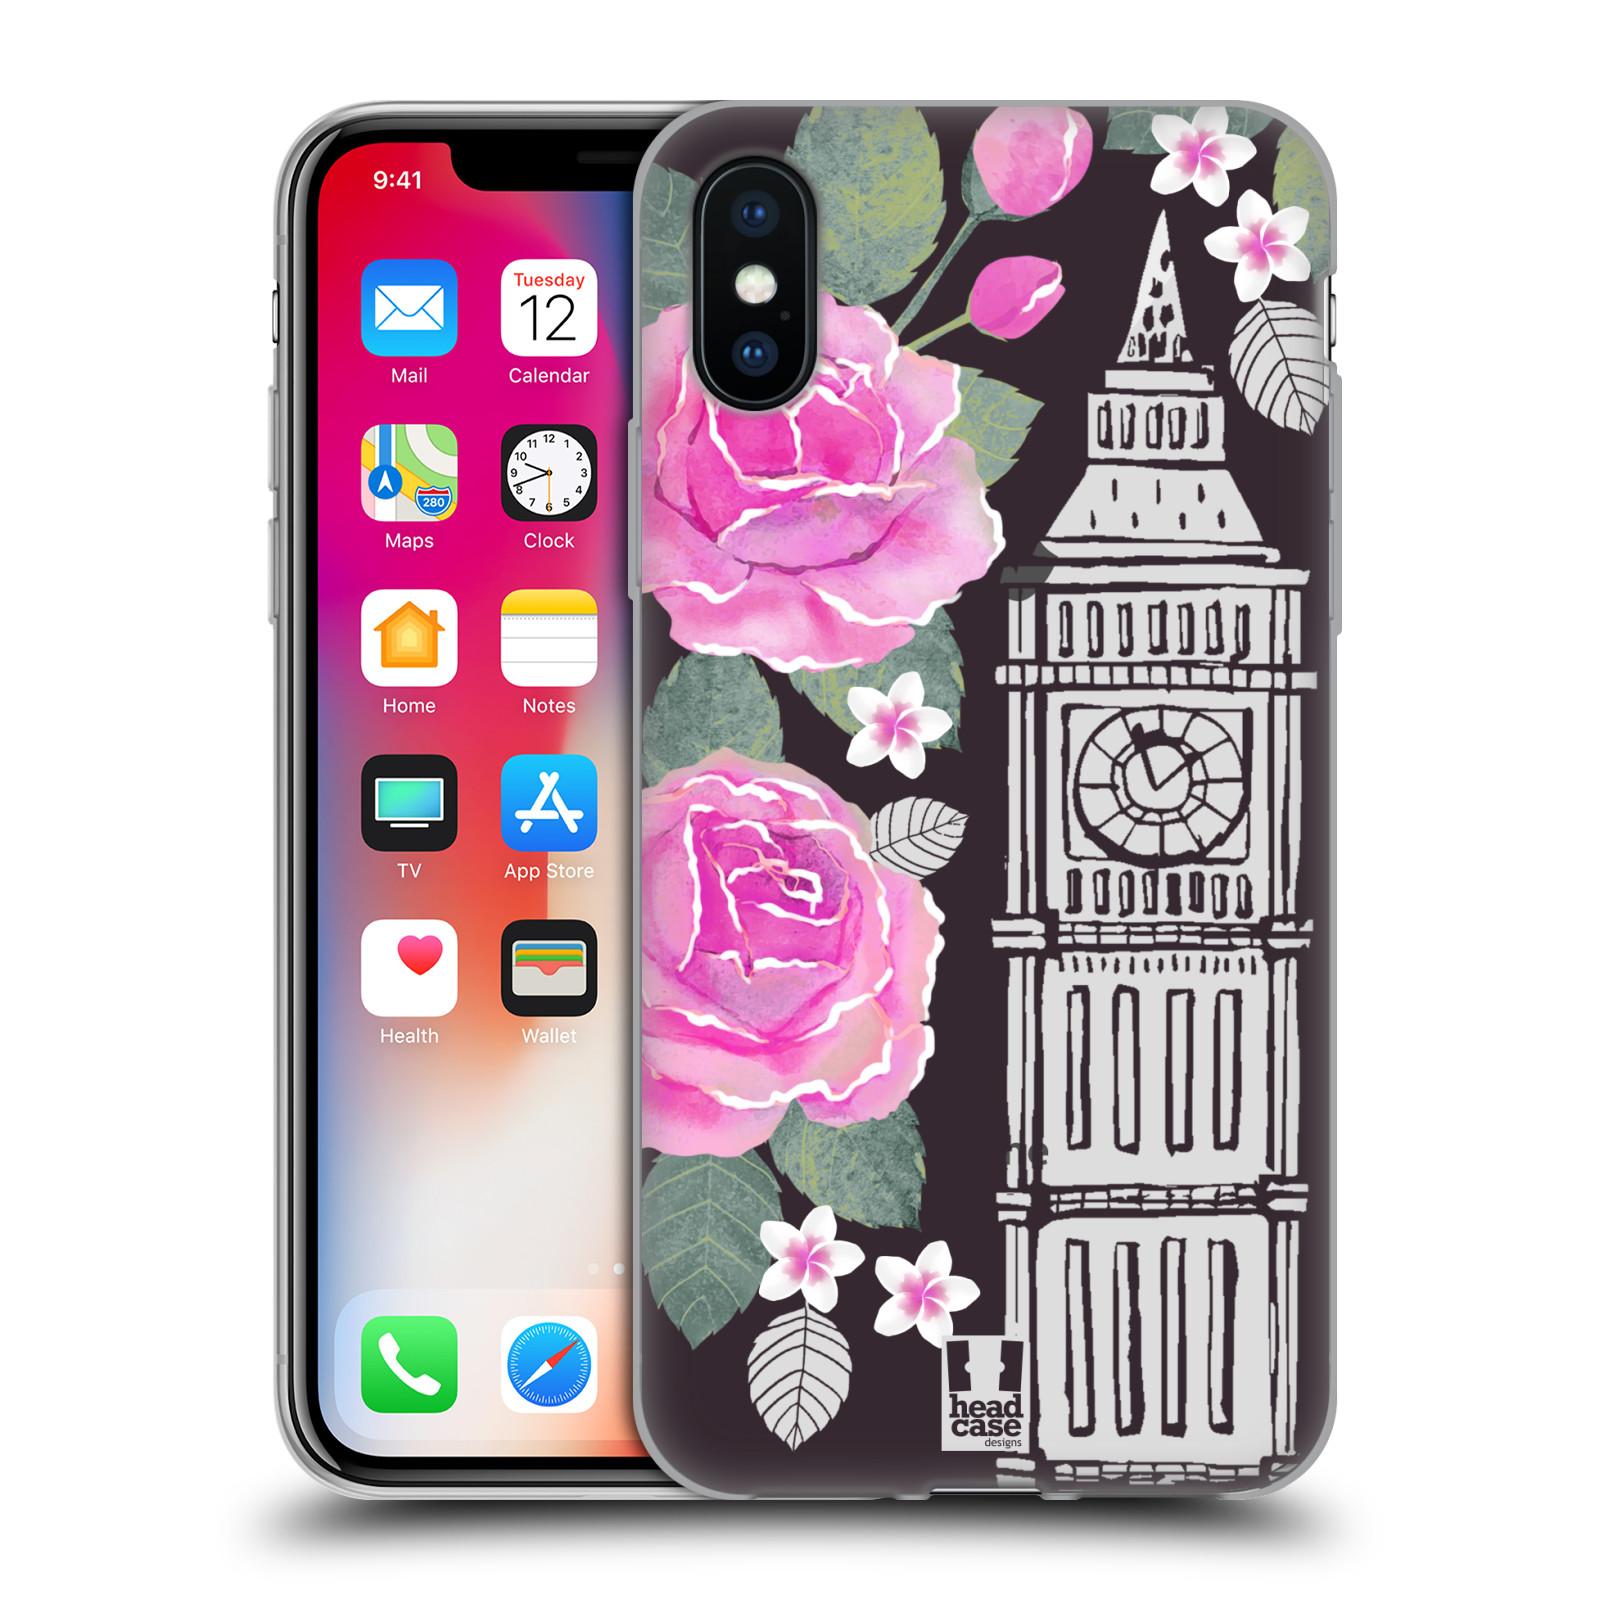 HEAD-CASE-DESIGNS-FLORAL-CITY-LANDMARKS-SOFT-GEL-CASE-FOR-APPLE-iPHONE-PHONES